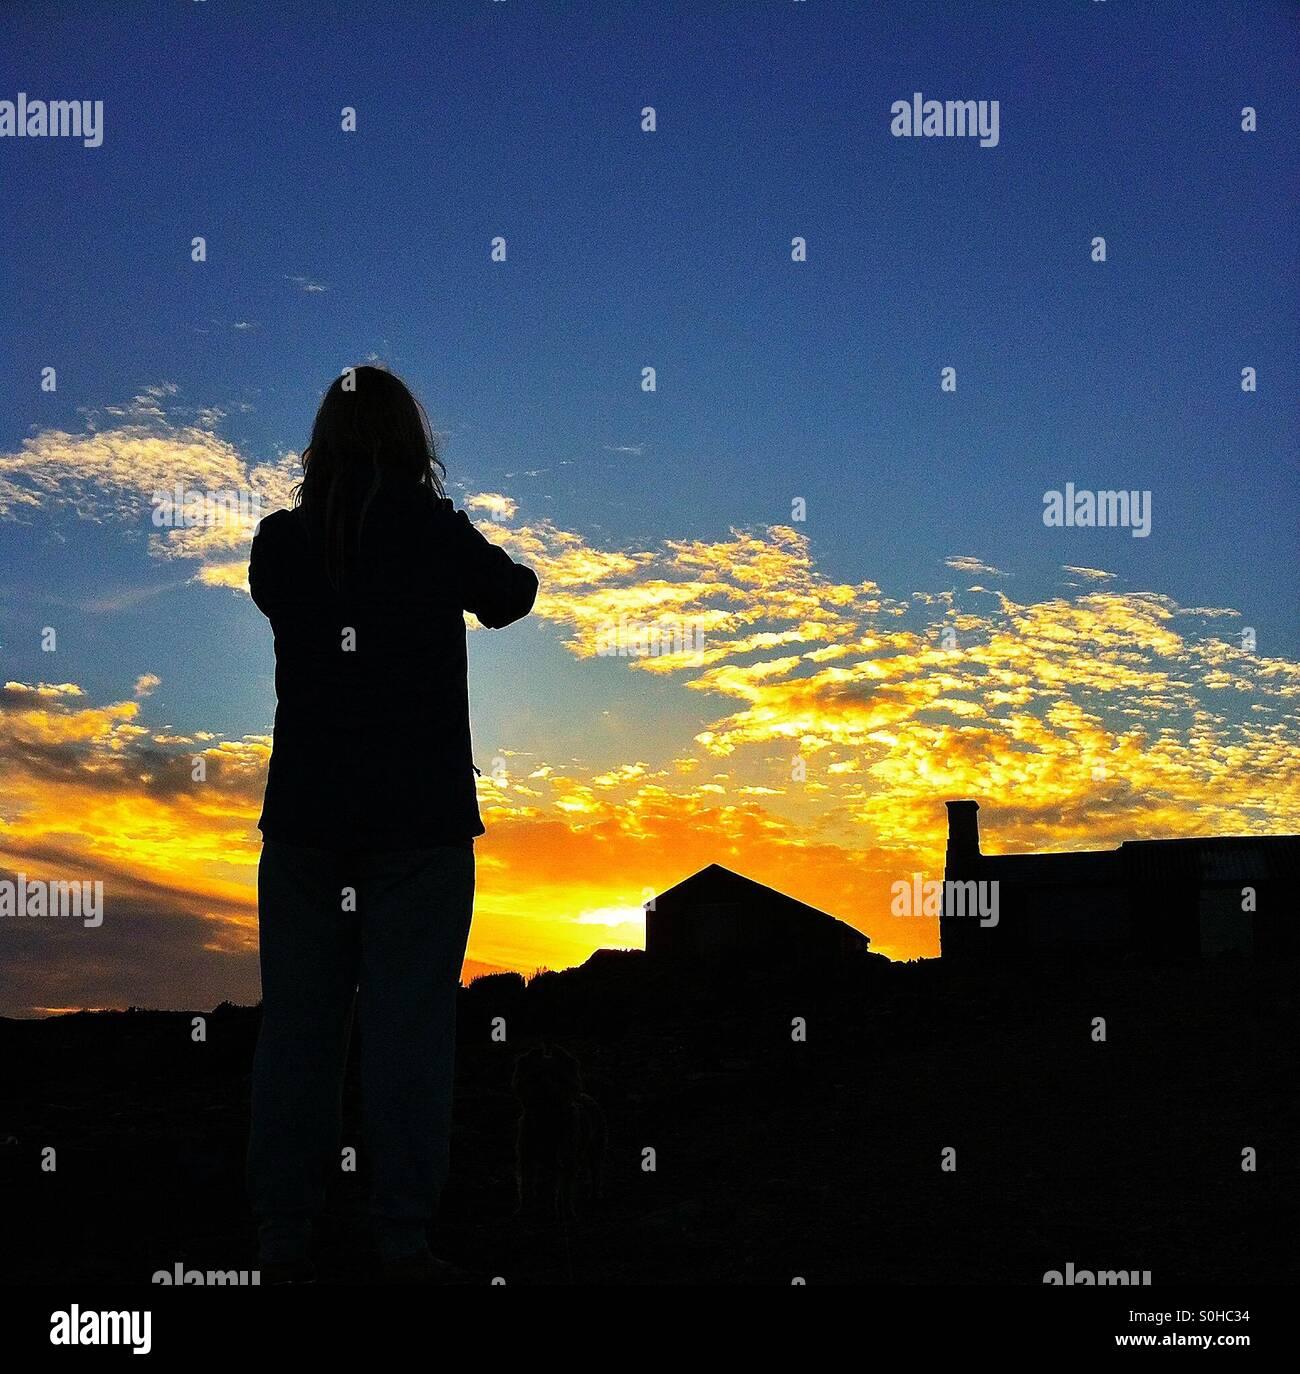 Watching the setting sun - Stock Image